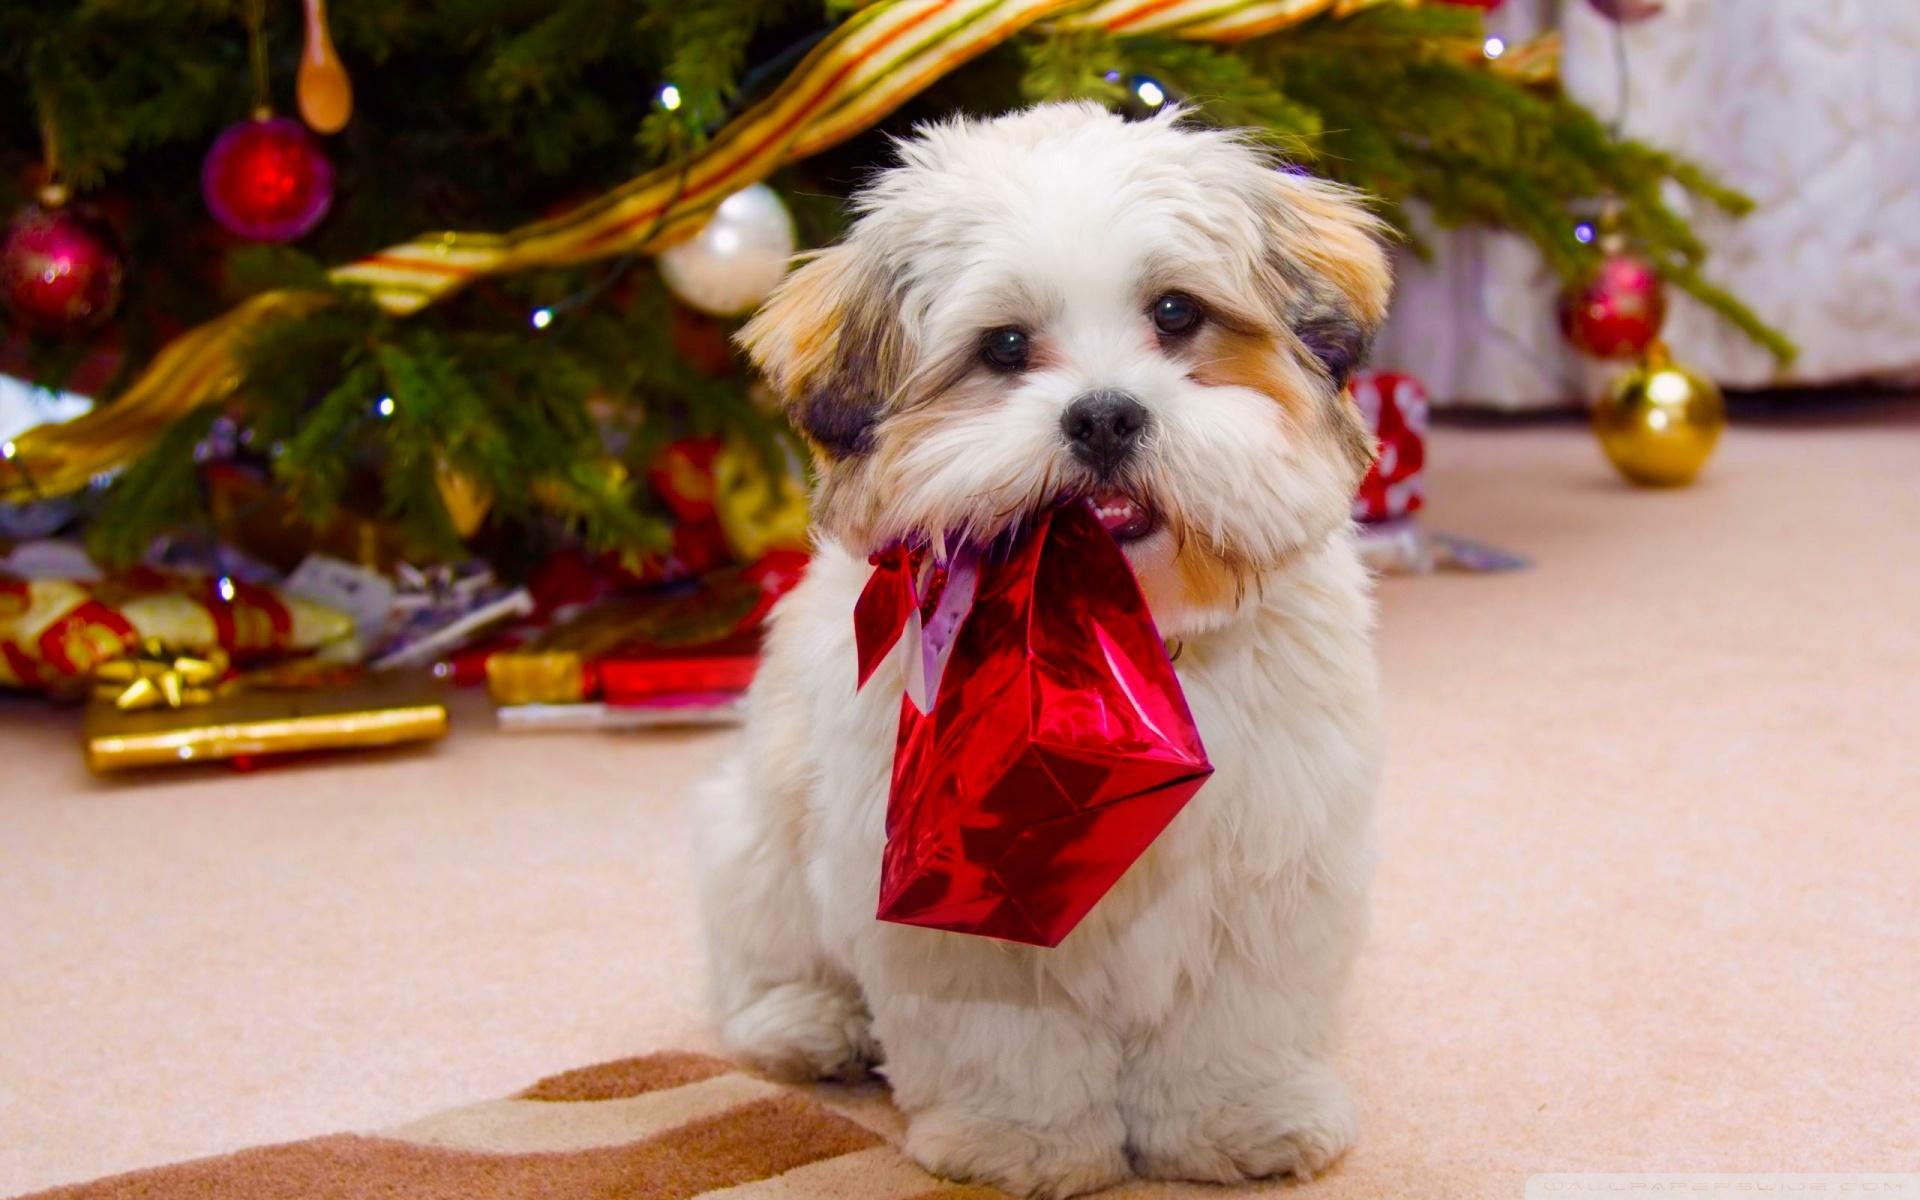 cute dog christmas wallpapers HD Desktop Wallpapers 1920x1200